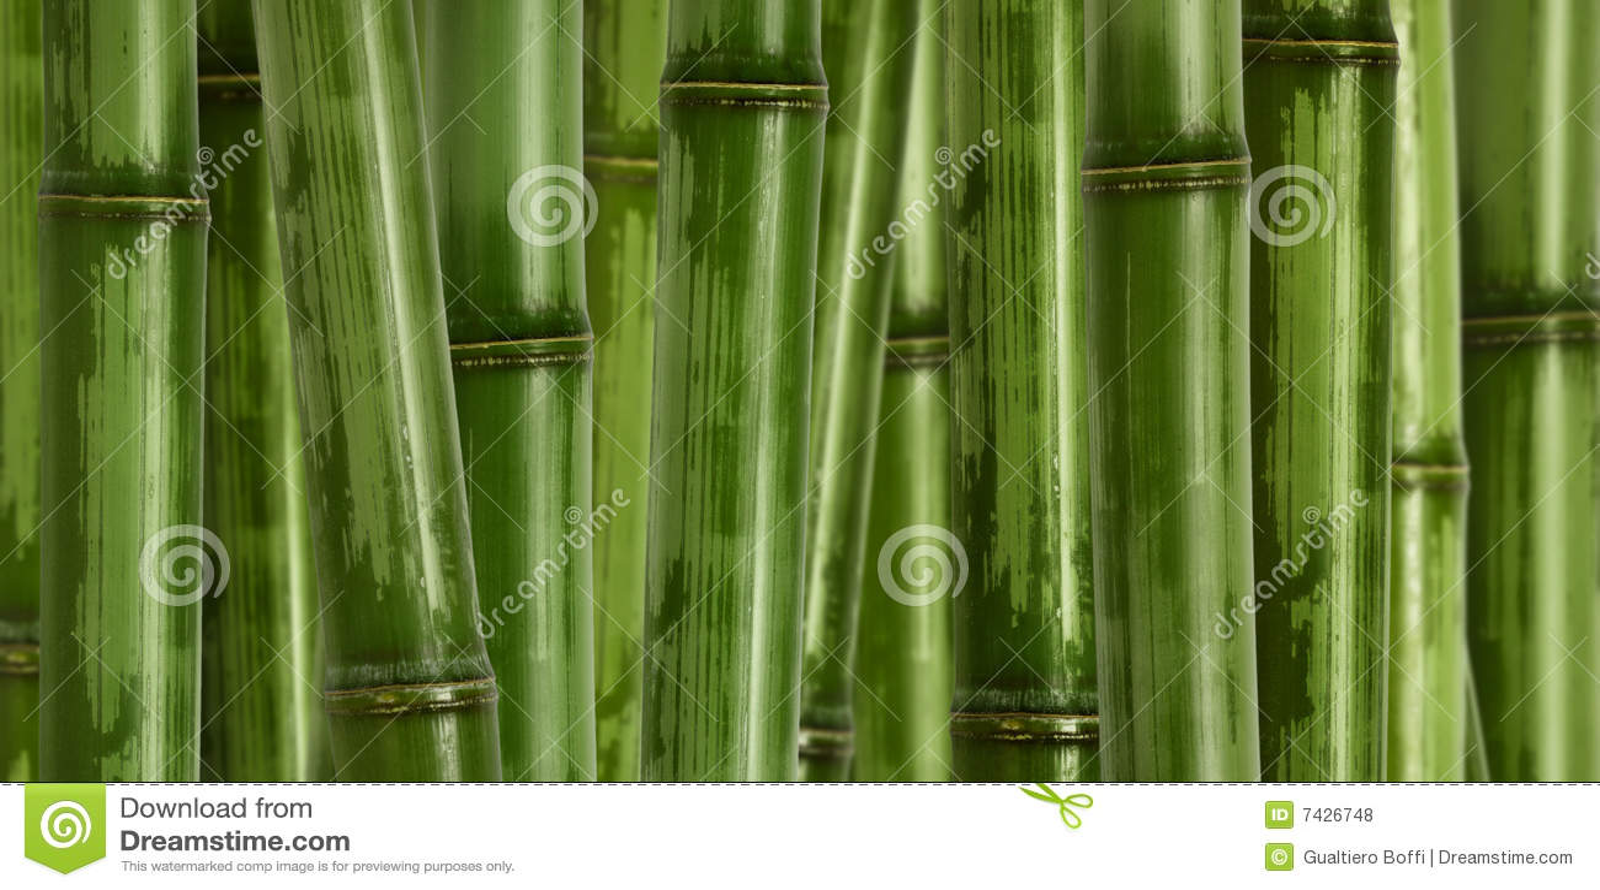 Priorità bassa di bambù dura larga